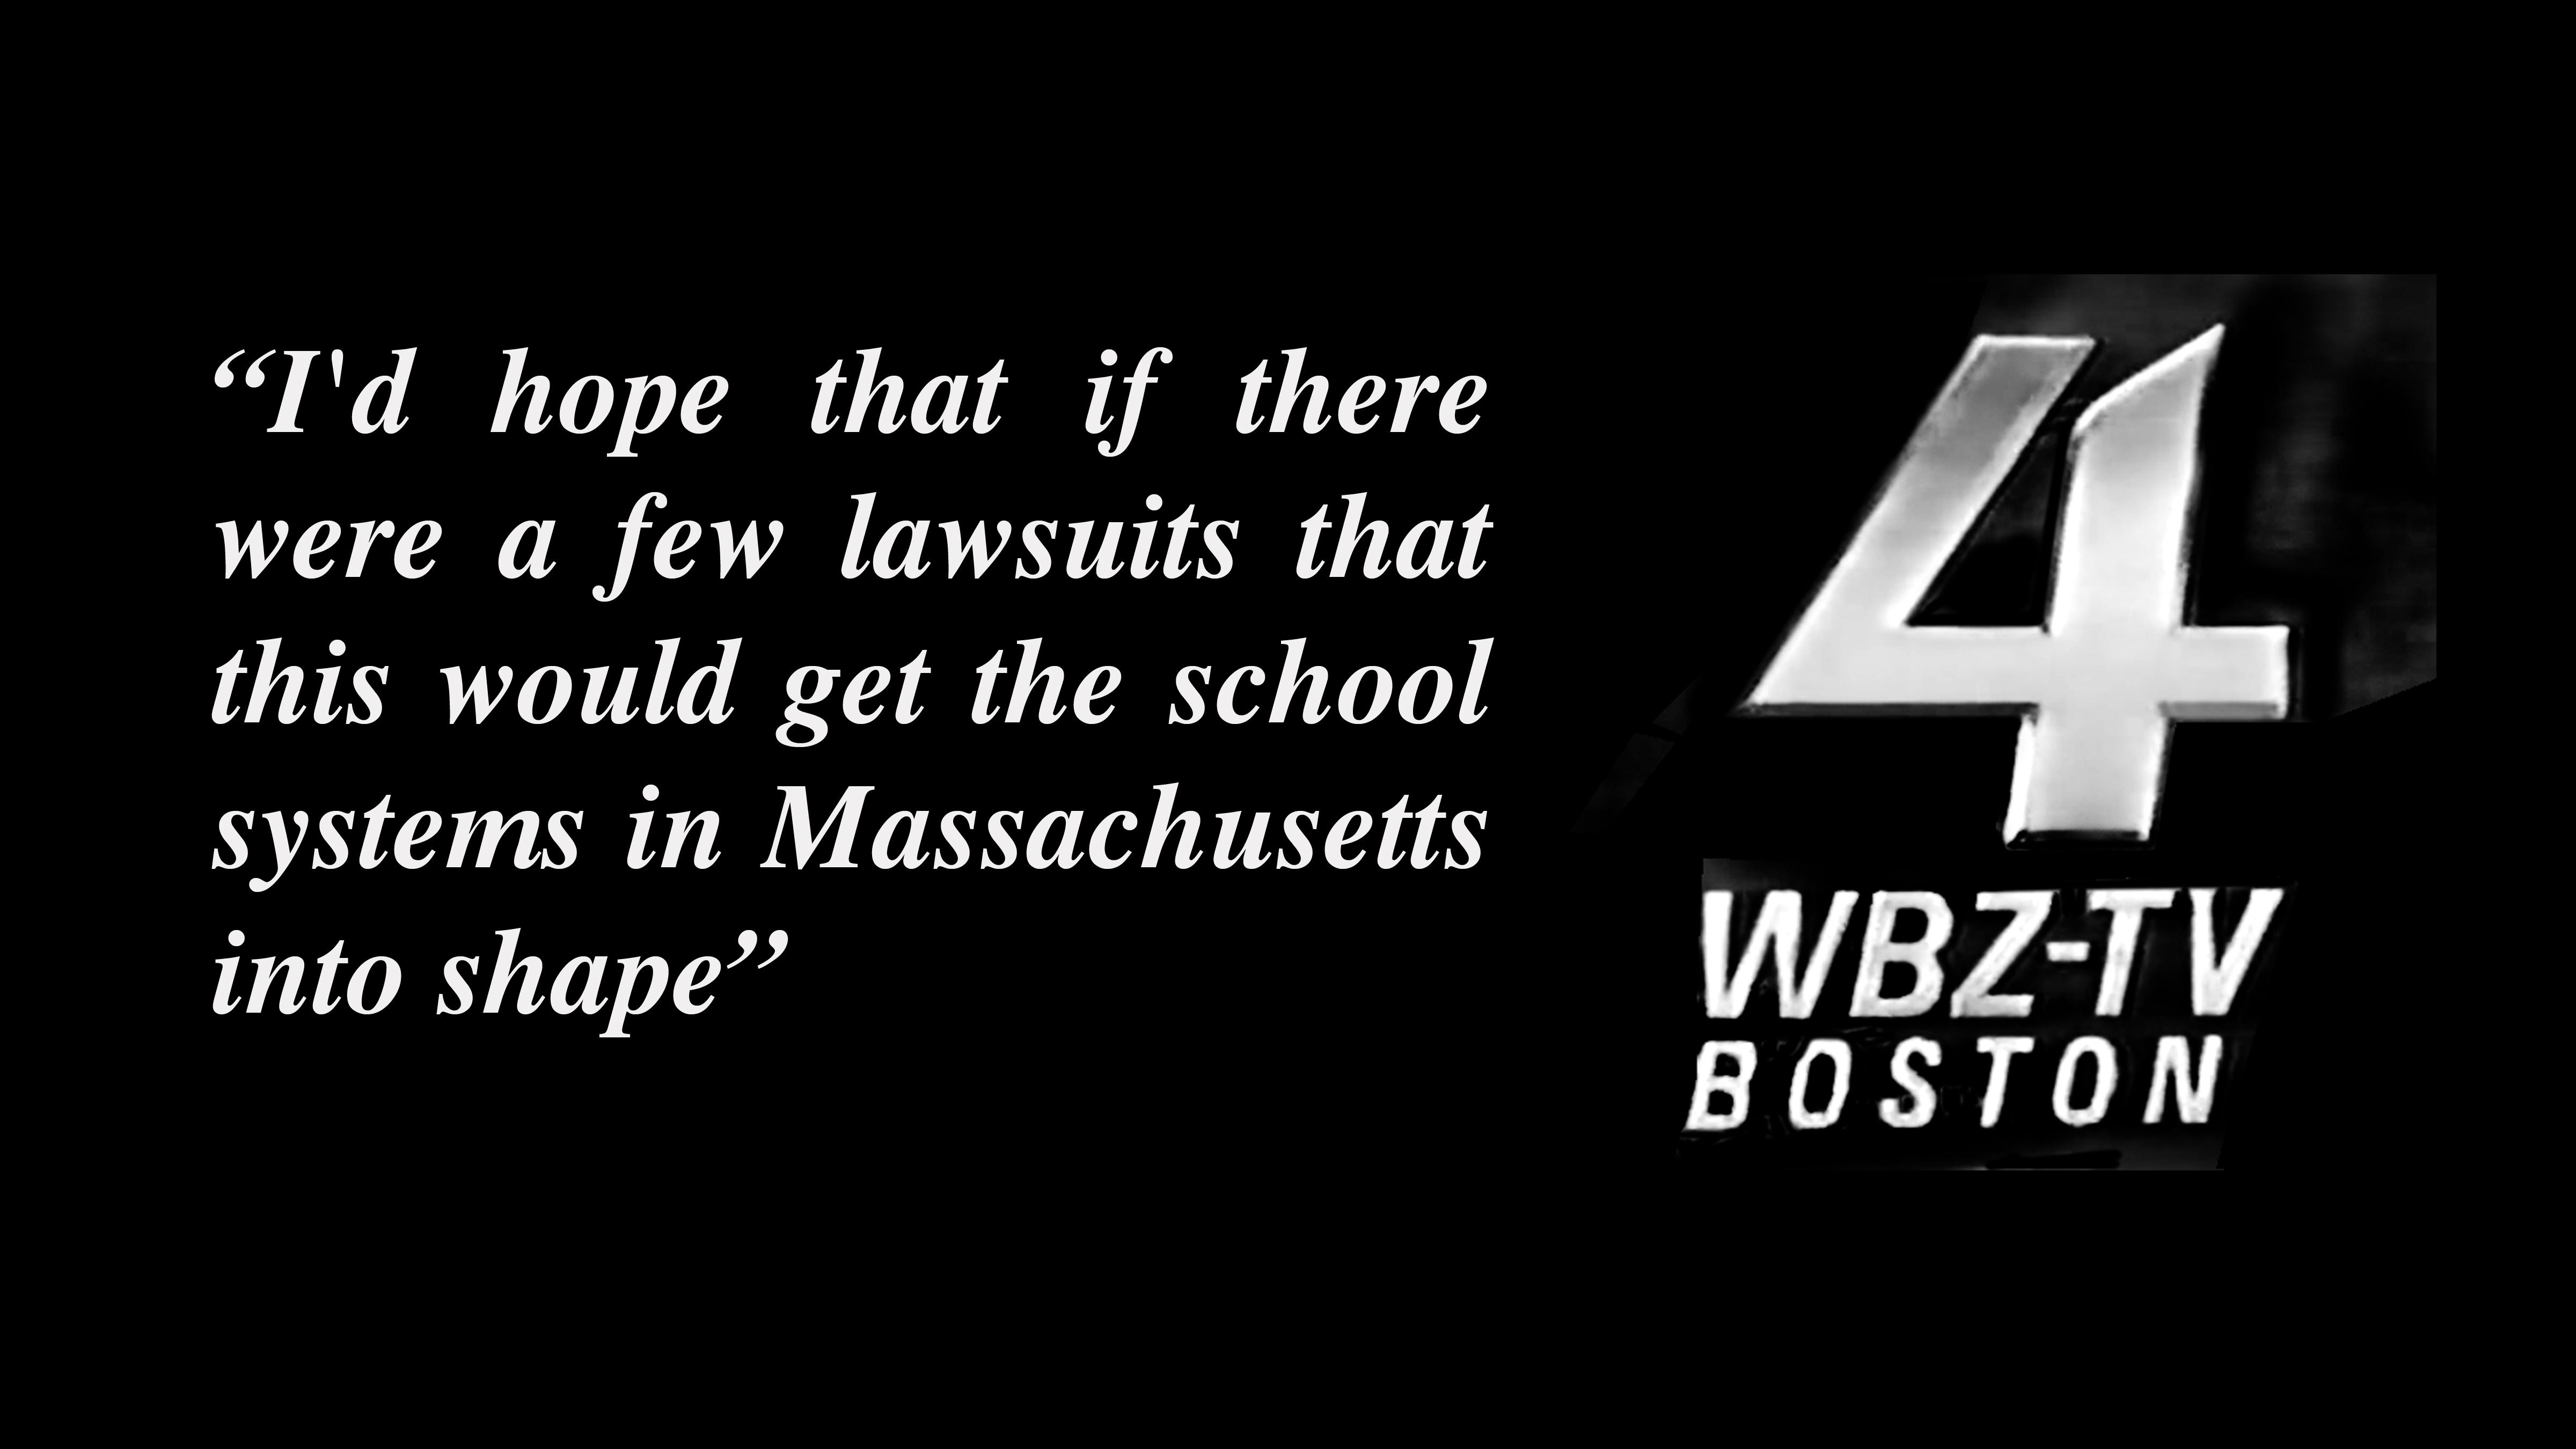 1993-12-10-WBZ-quoteL-16x9-300dpi WBZ-TV 4 Boston 12/10/93 LGBTQ